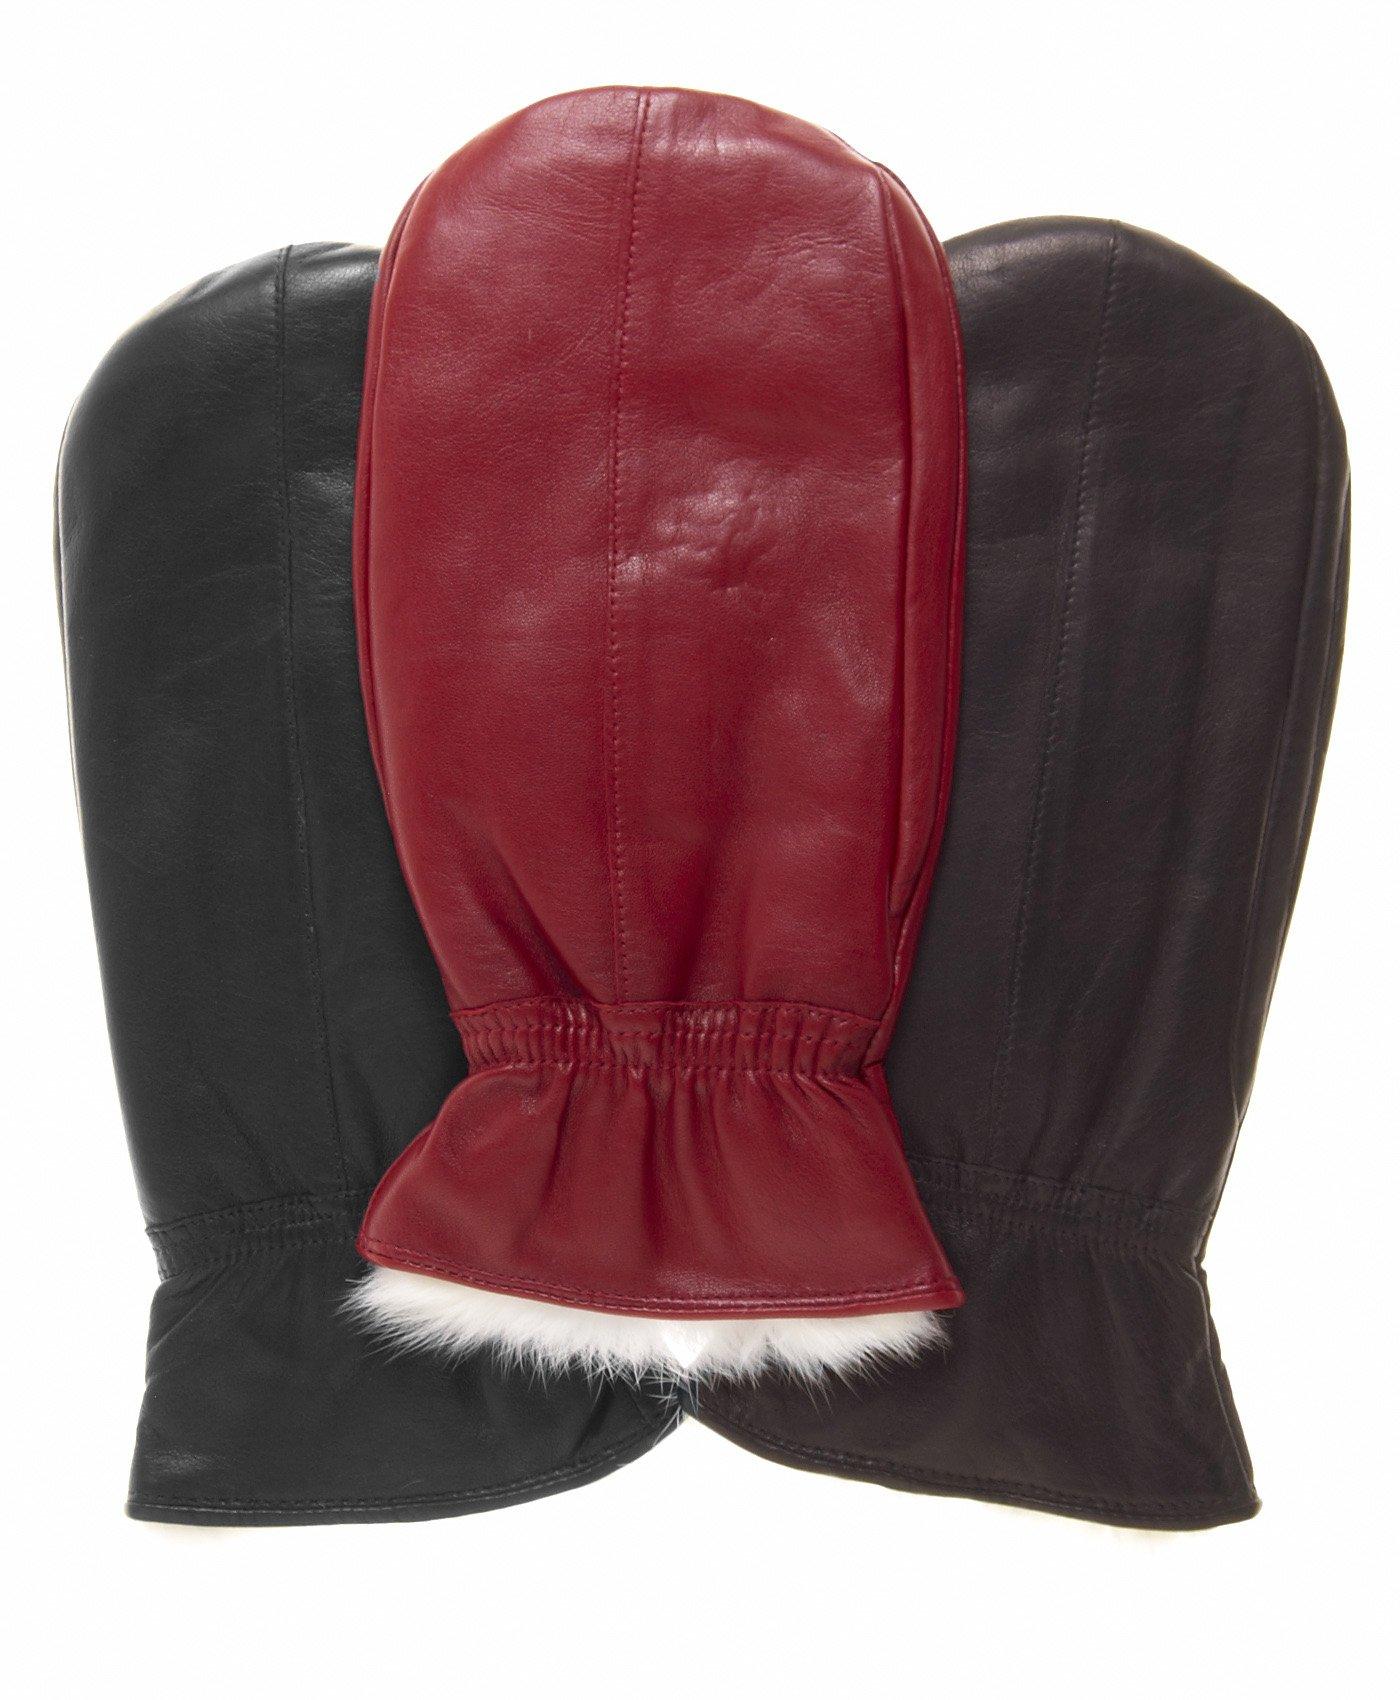 Pratt and Hart Women's Rabbit Fur Leather Mittens Size M Color Black by Pratt and Hart